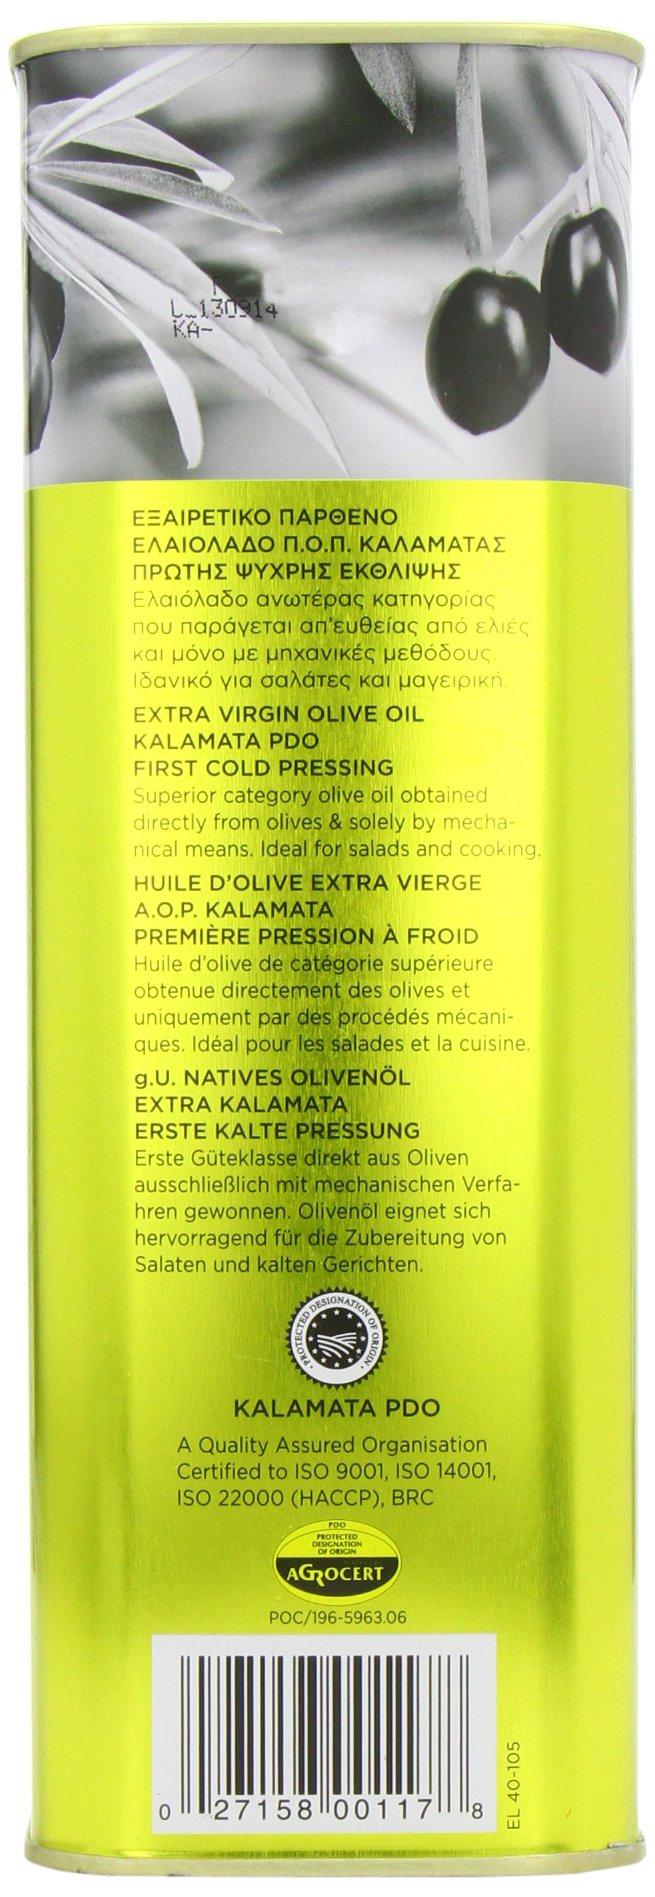 Iliada Extra Virgin Olive Oil Tin, 3 Liter by Iliada (Image #5)